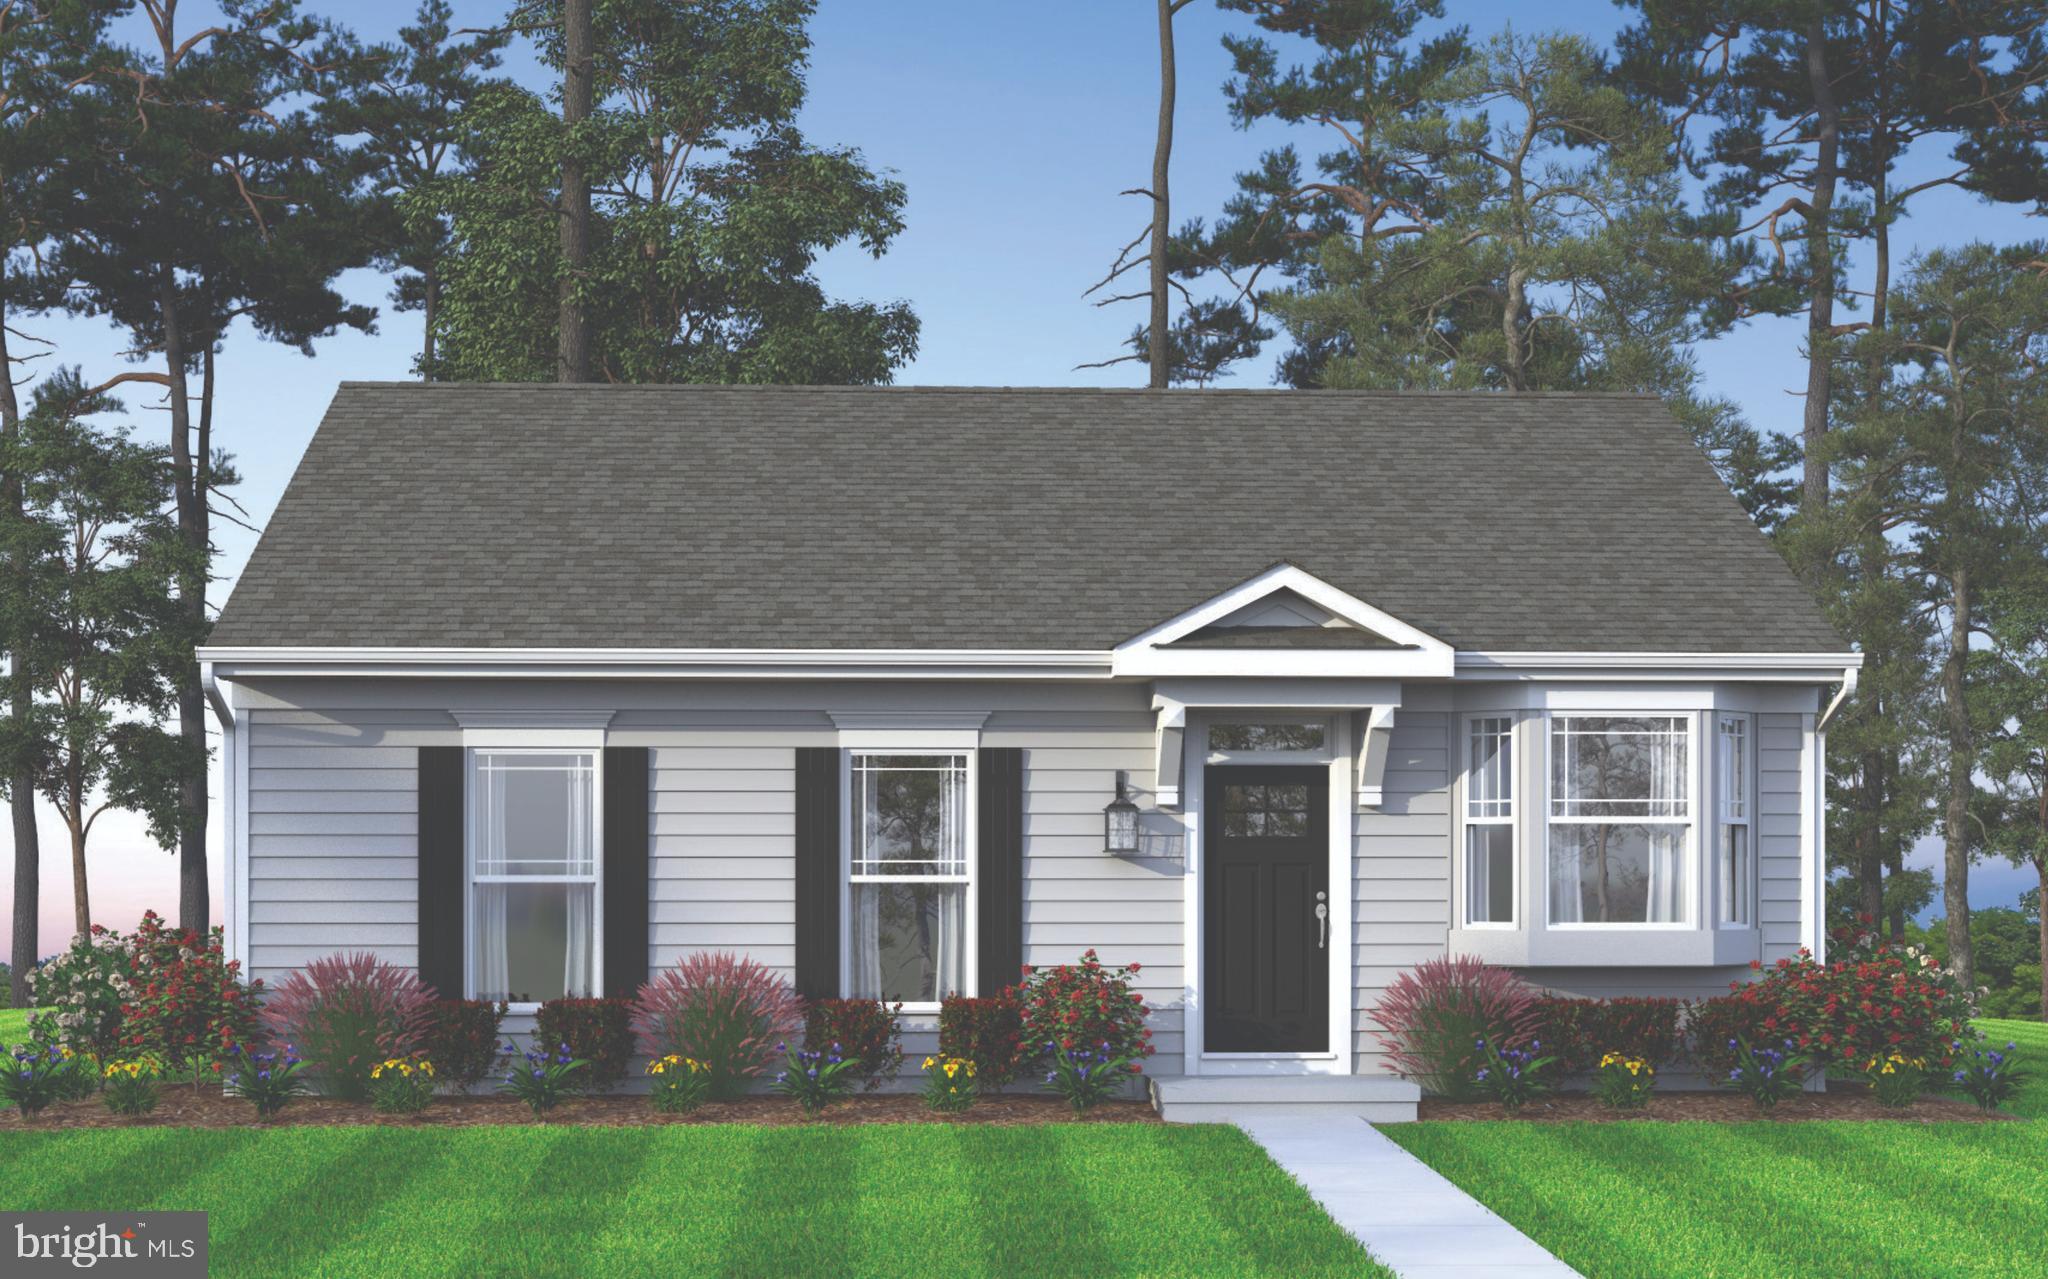 Lot 862 Broadside Dr, Greenbackville, VA, 23356